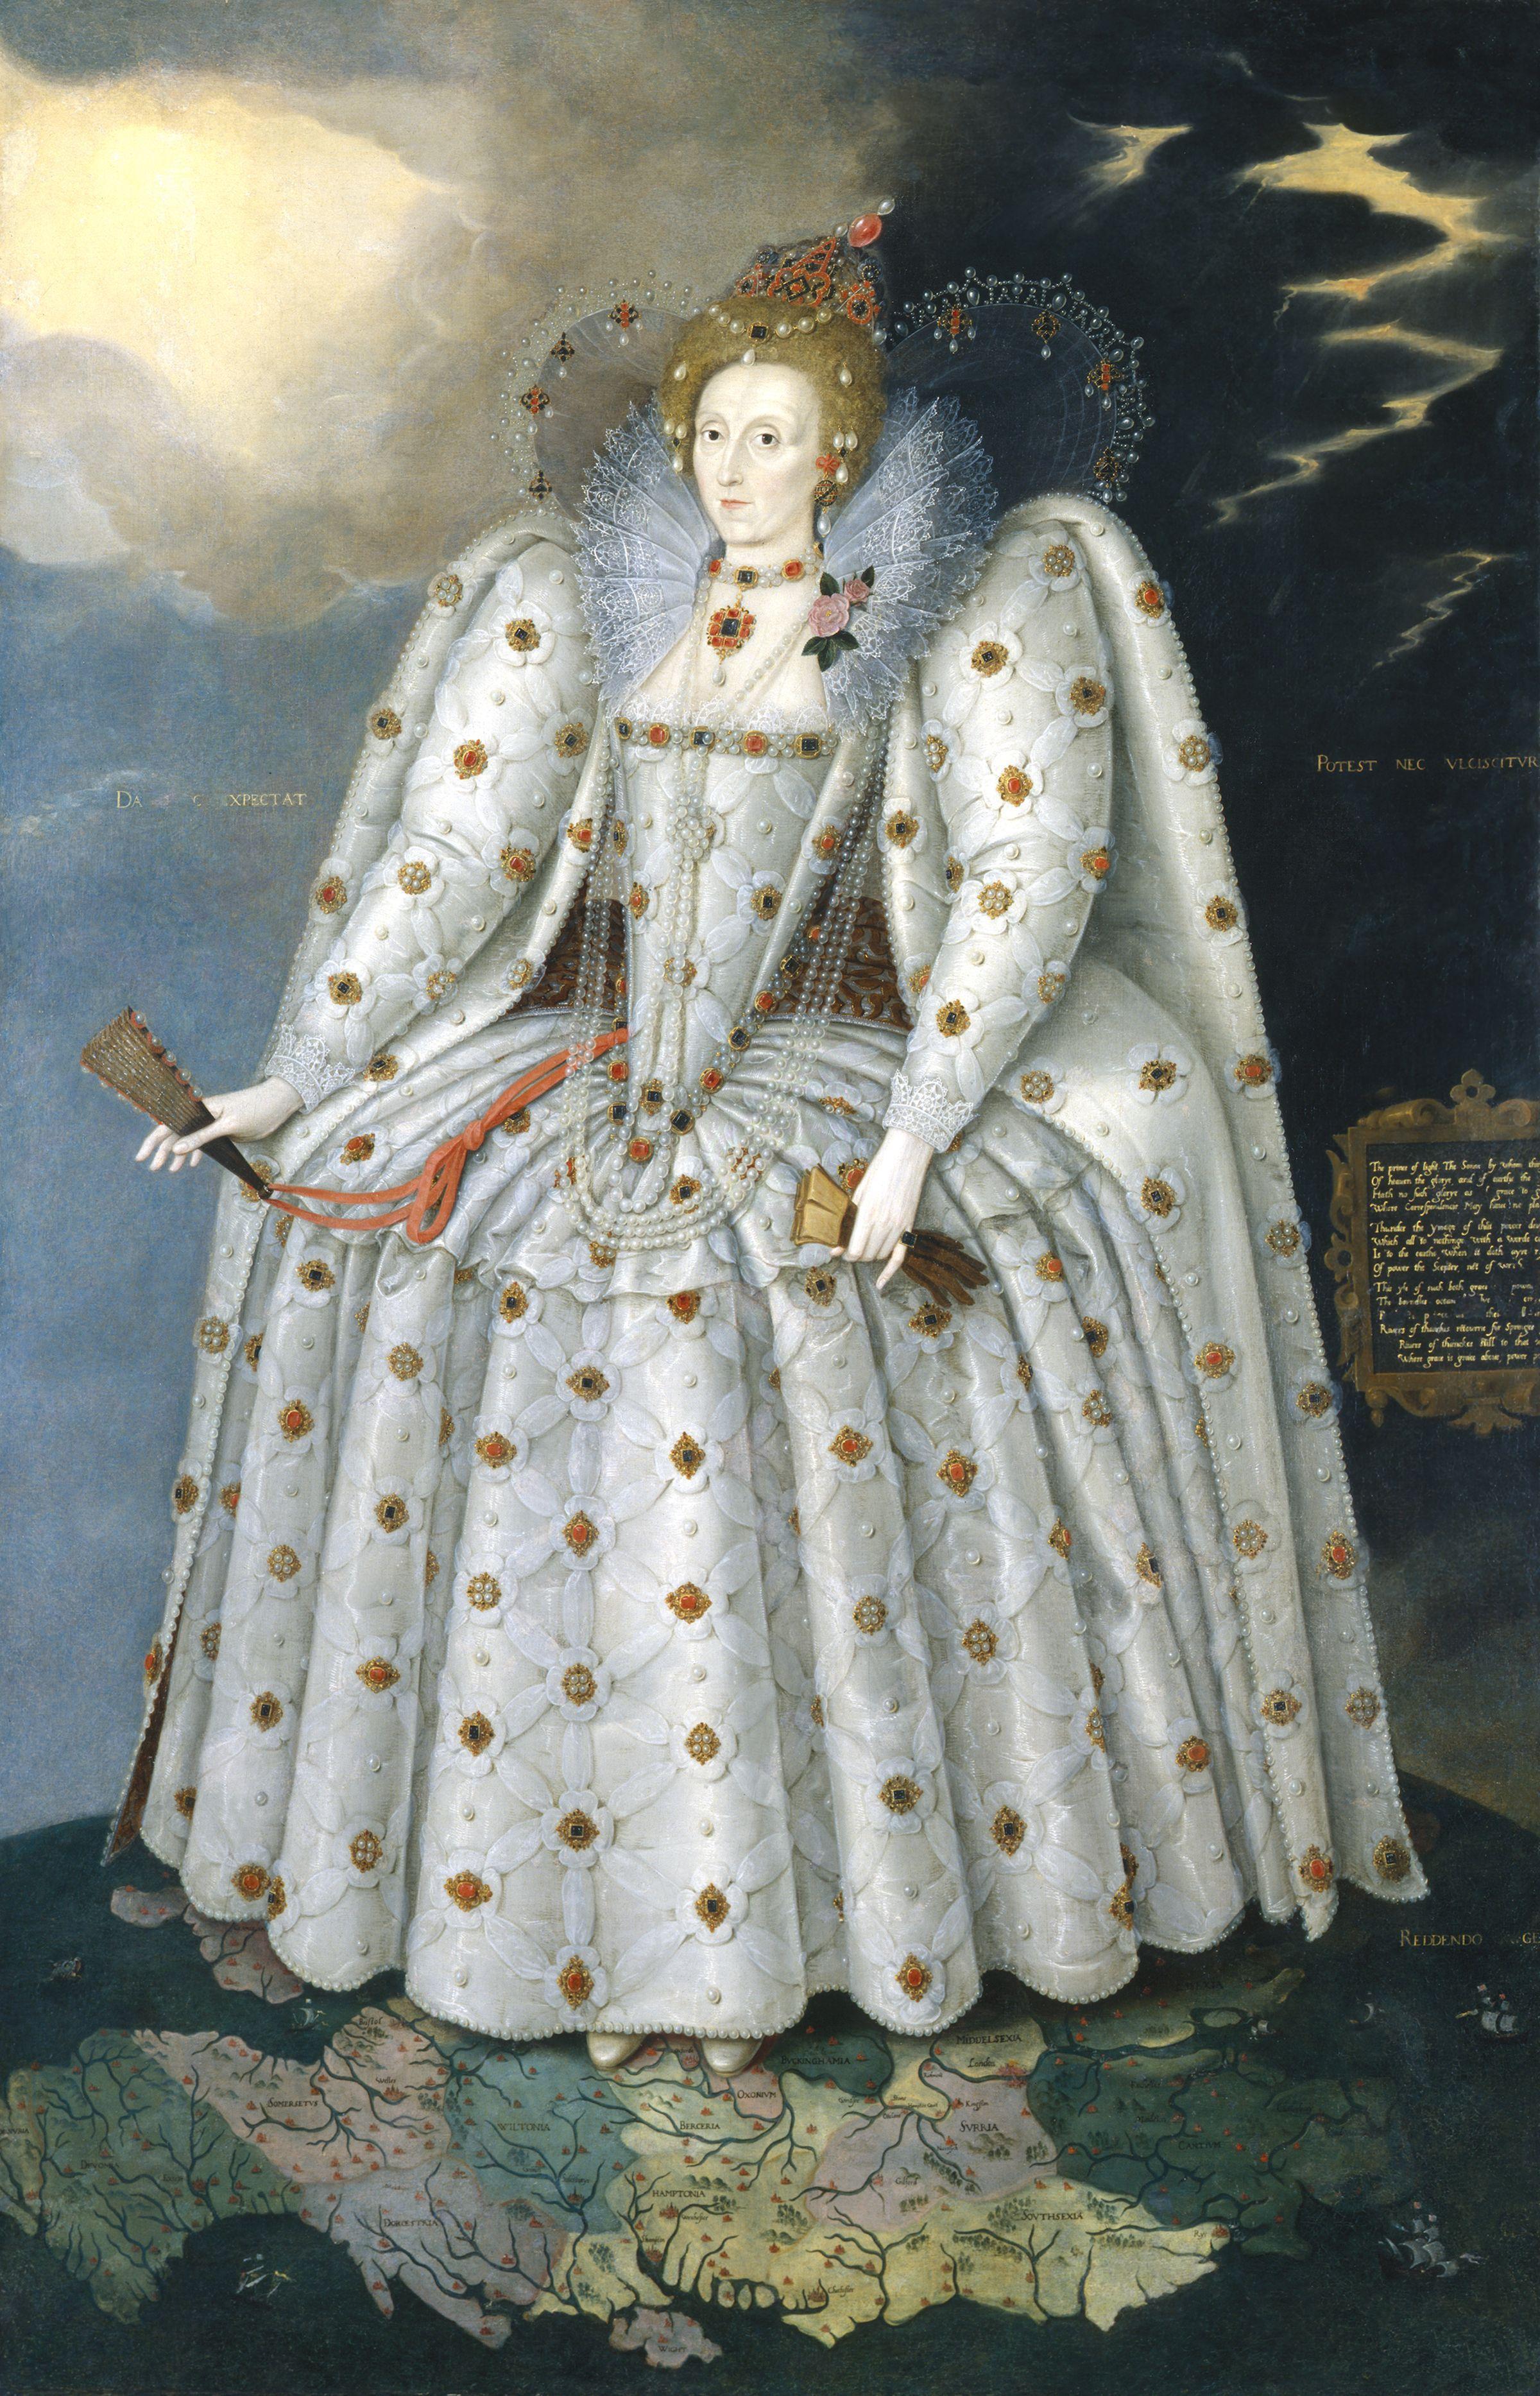 Queen Elizabeth I: Biography, Facts, Portraits & Information